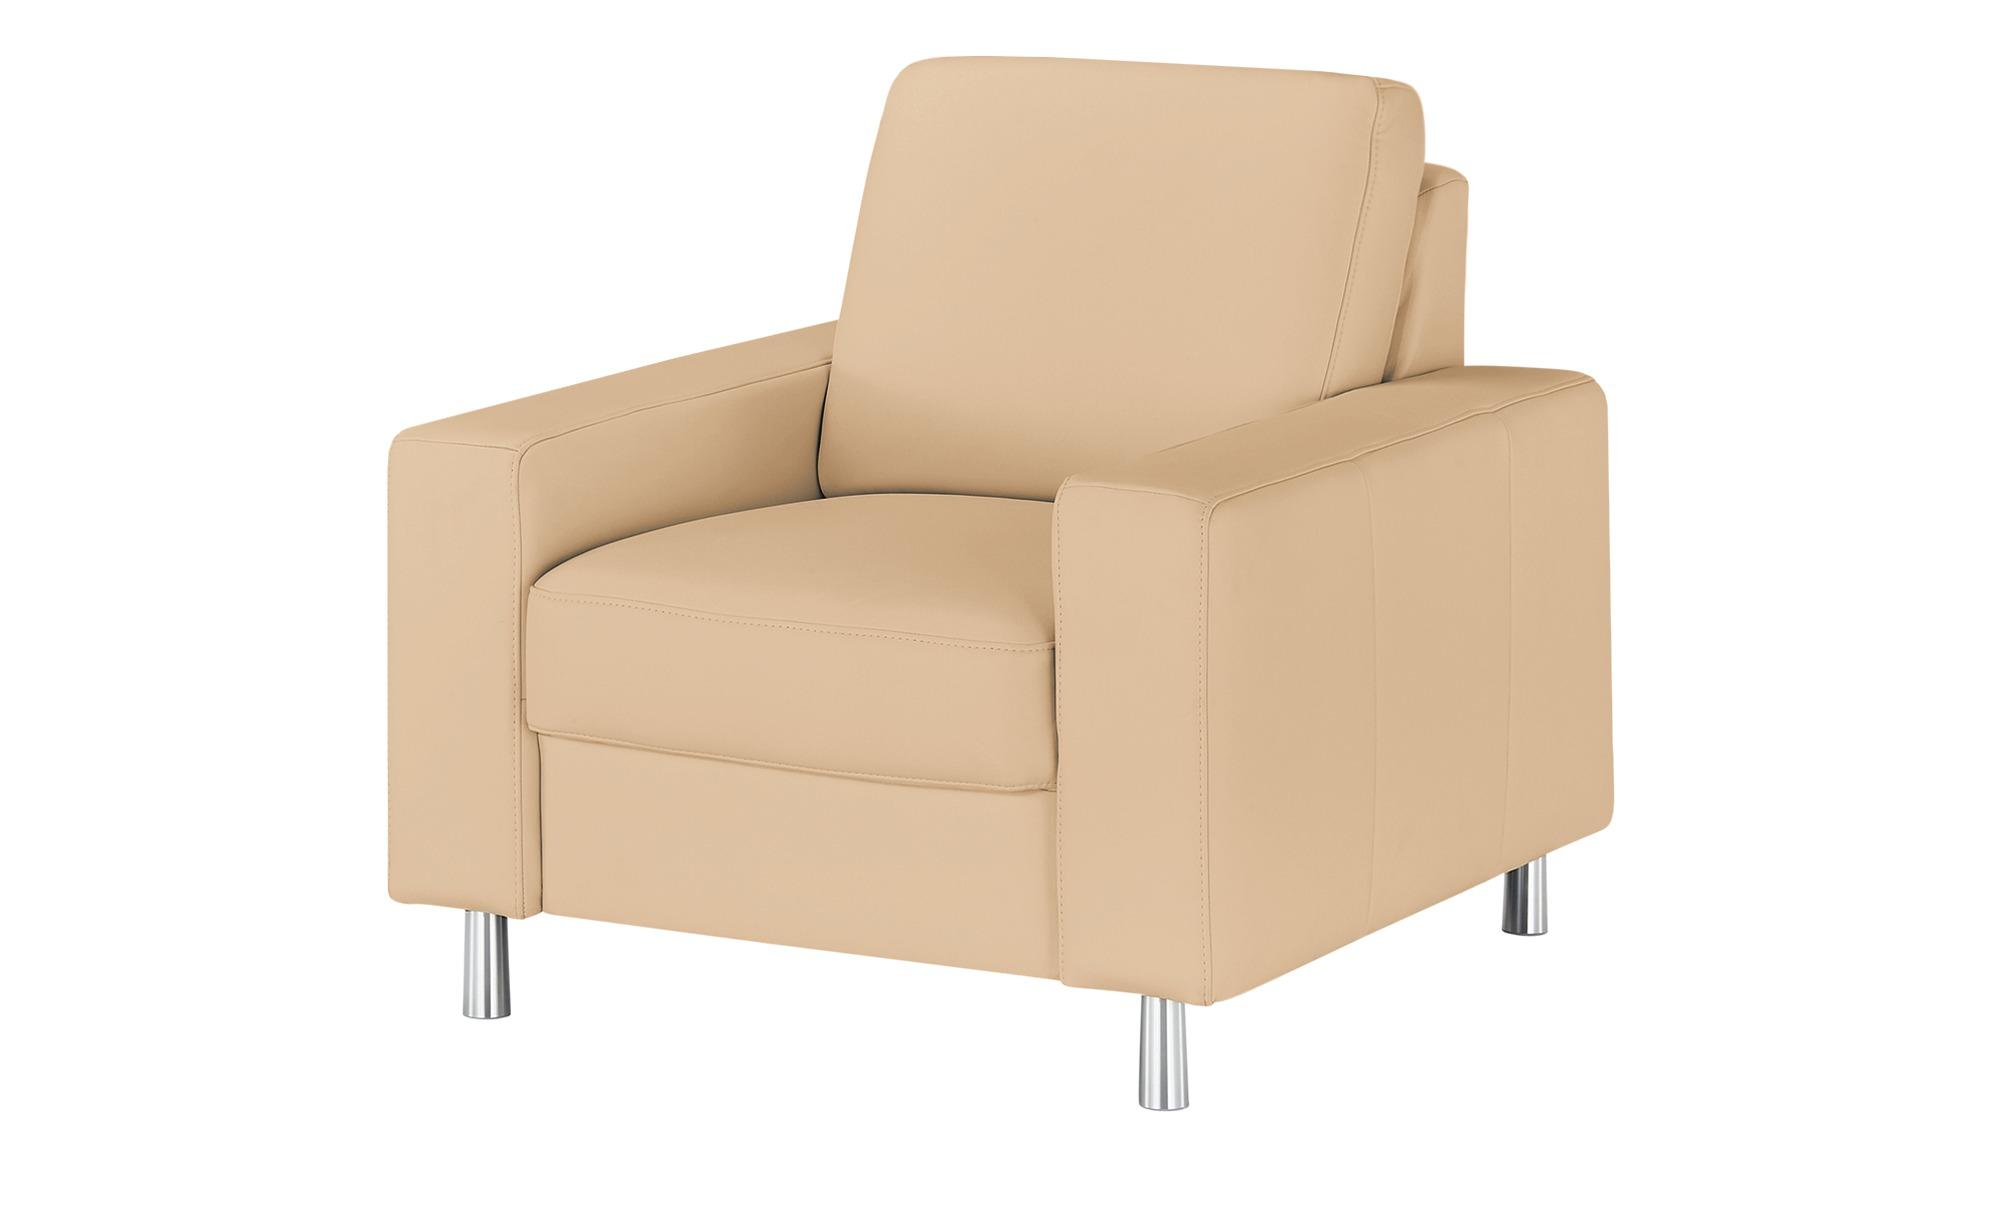 meinSofa Sessel  Byron ¦ braun ¦ Maße (cm): B: 88 H: 86 T: 95 Polstermöbel > Sessel > Ledersessel - Höffner